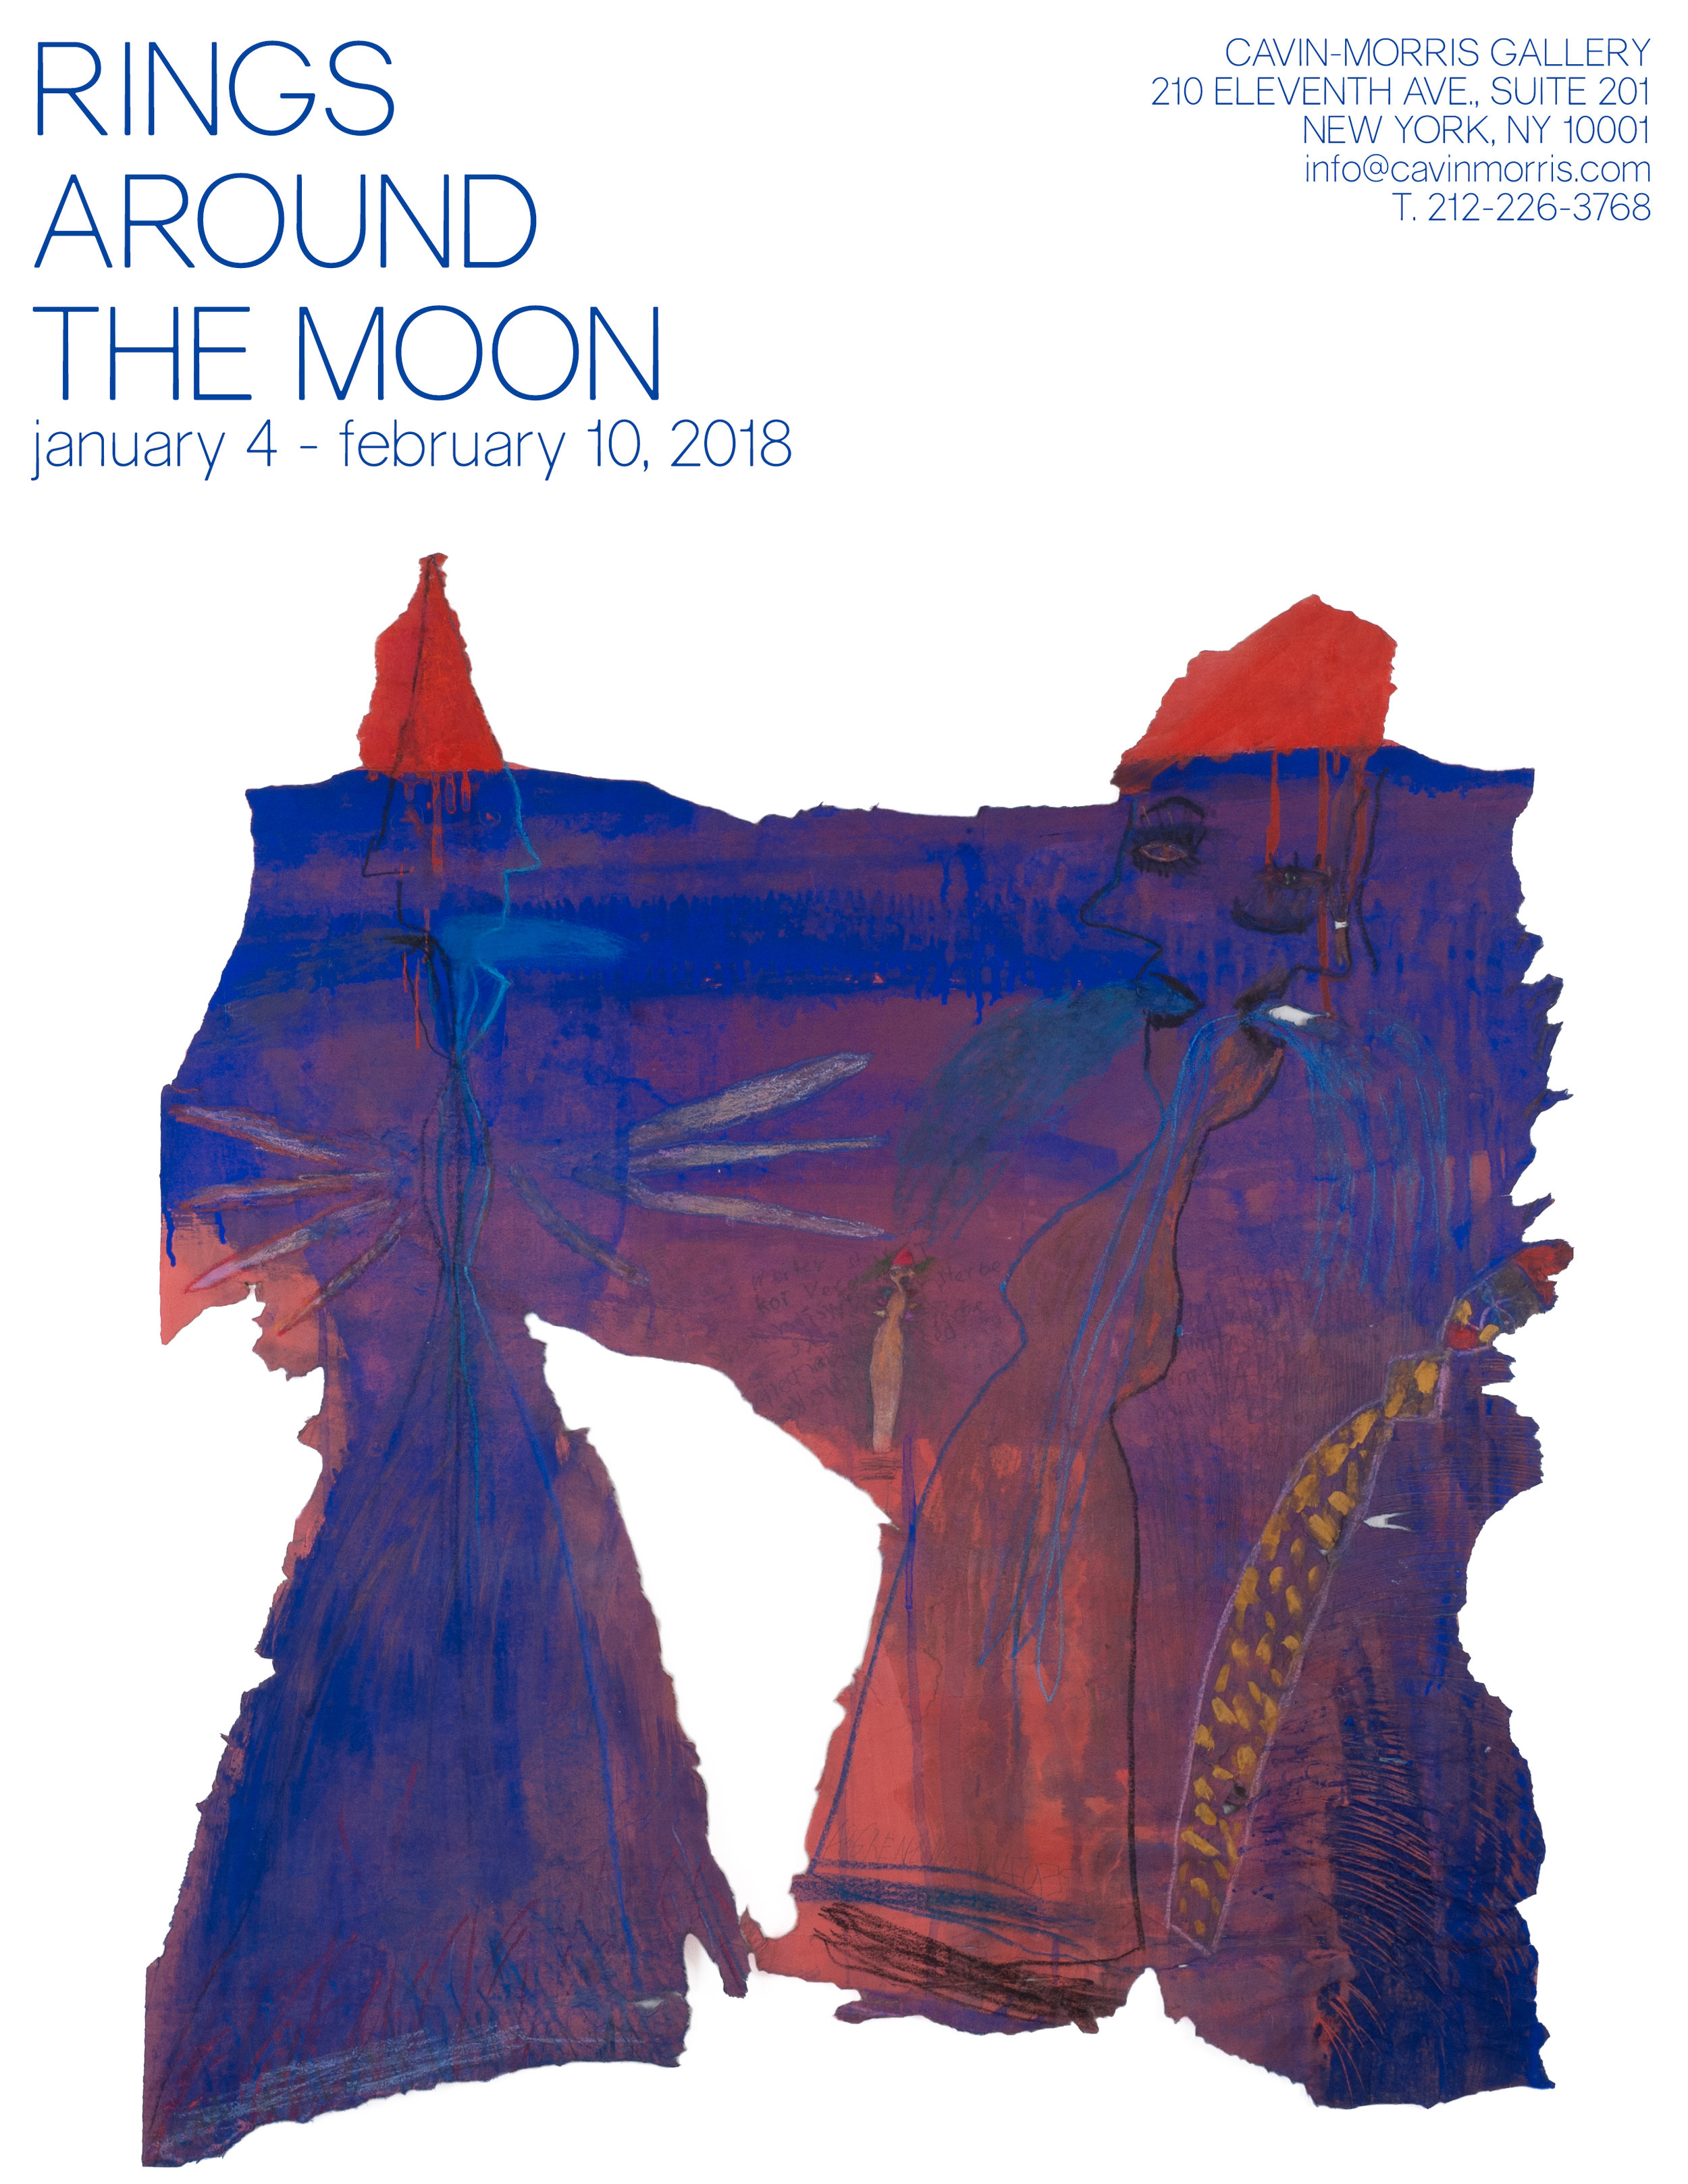 Rings around the moon poster.jpg